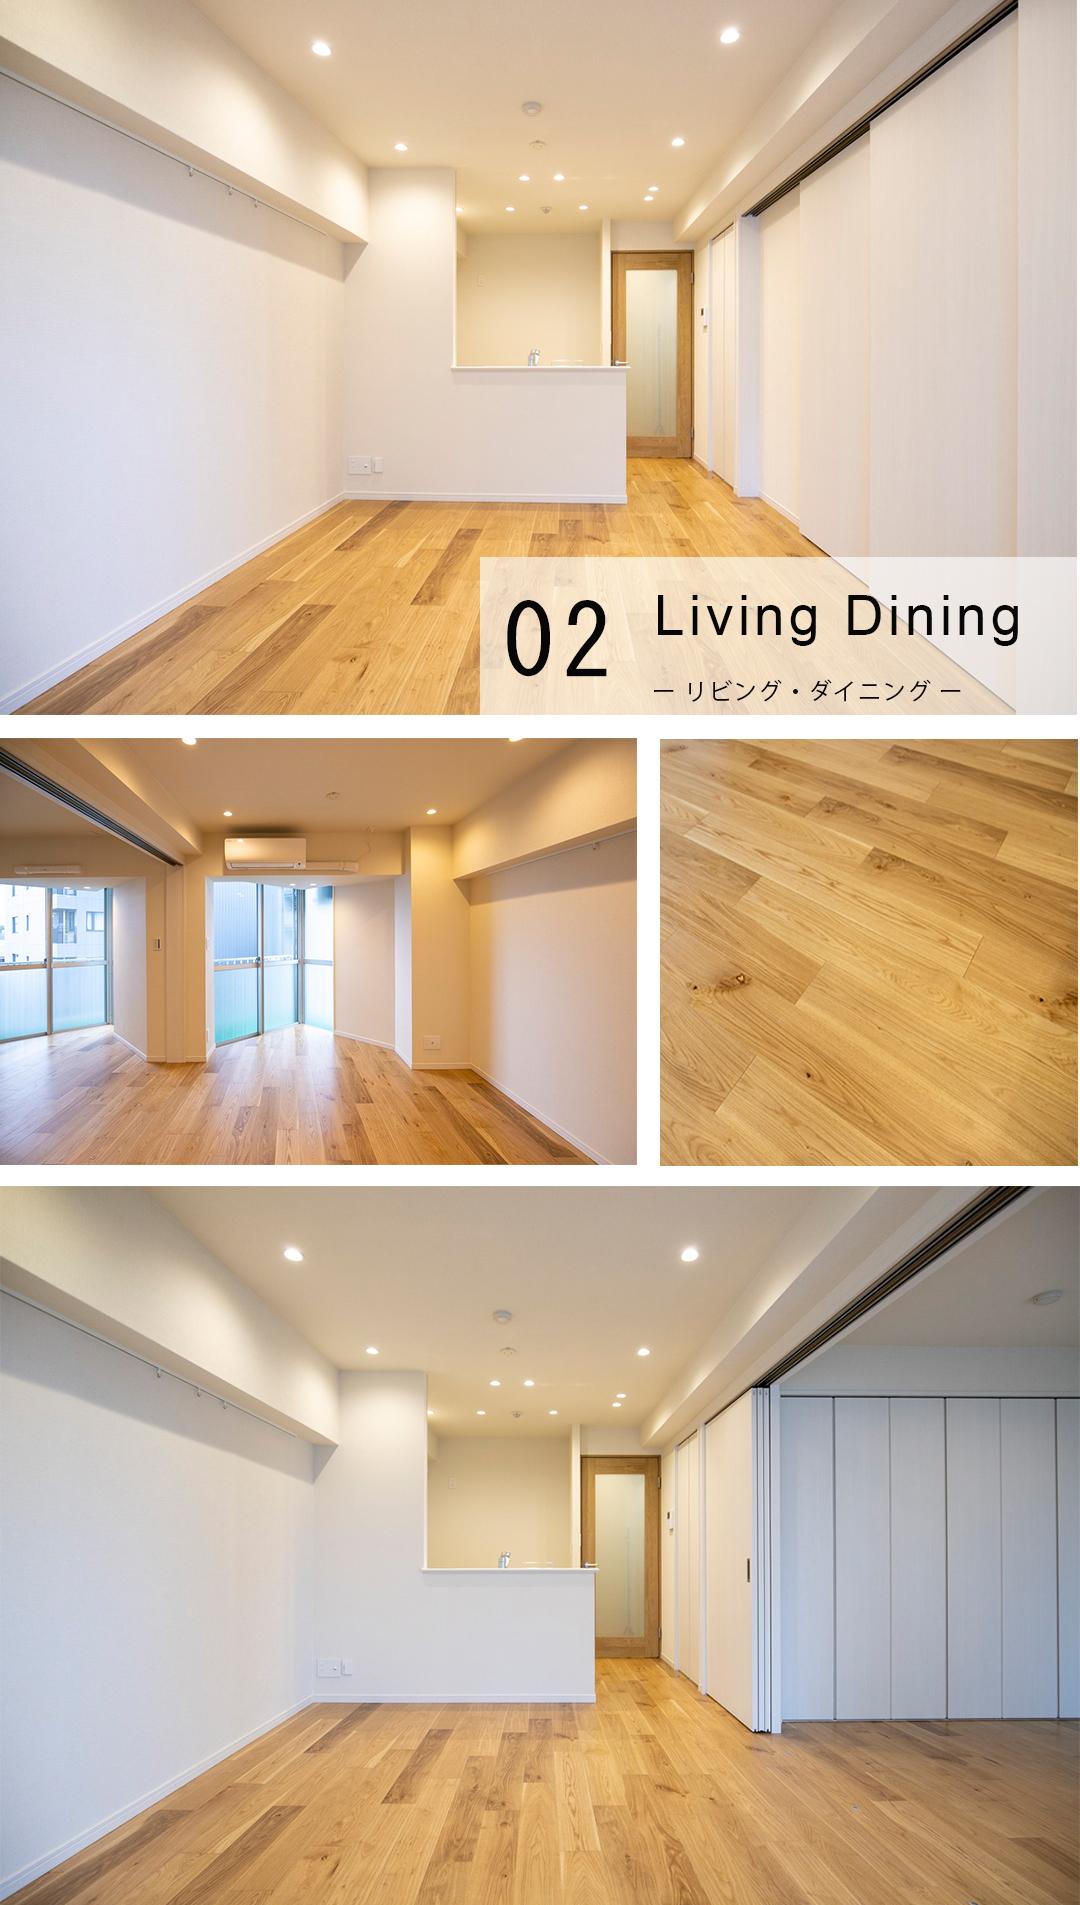 02,LivingDining,リビングダイニングキッチン